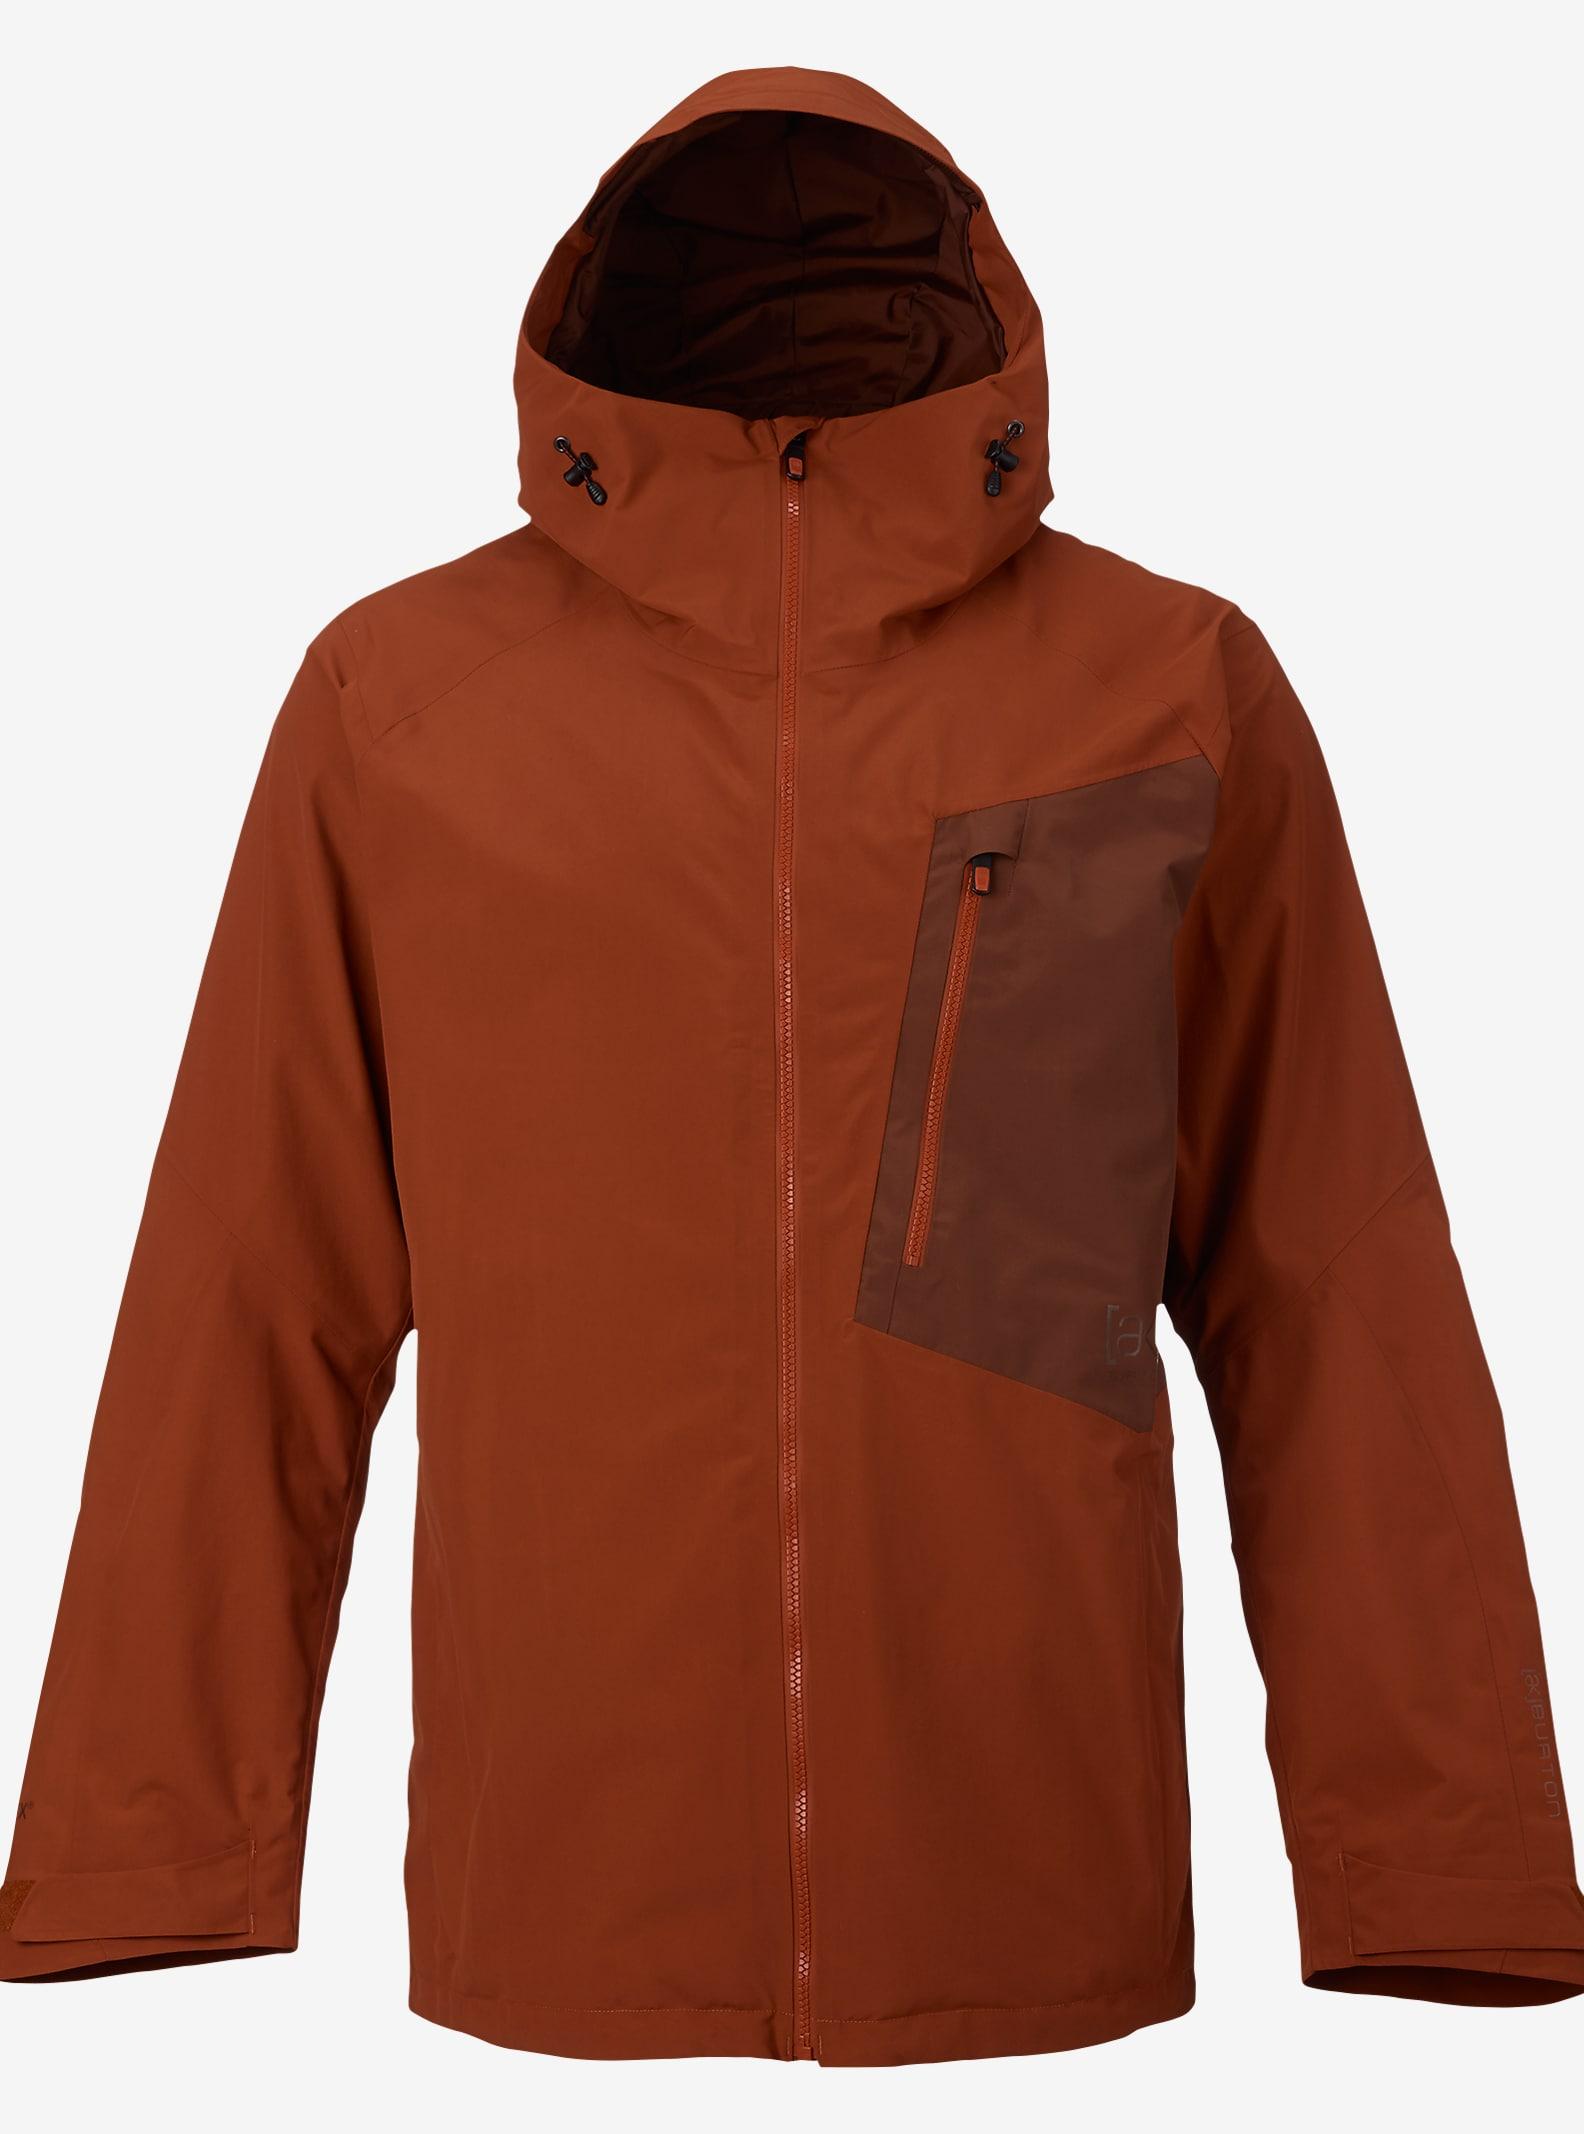 Burton [ak] 2L Cyclic Jacket shown in Matador / Picante